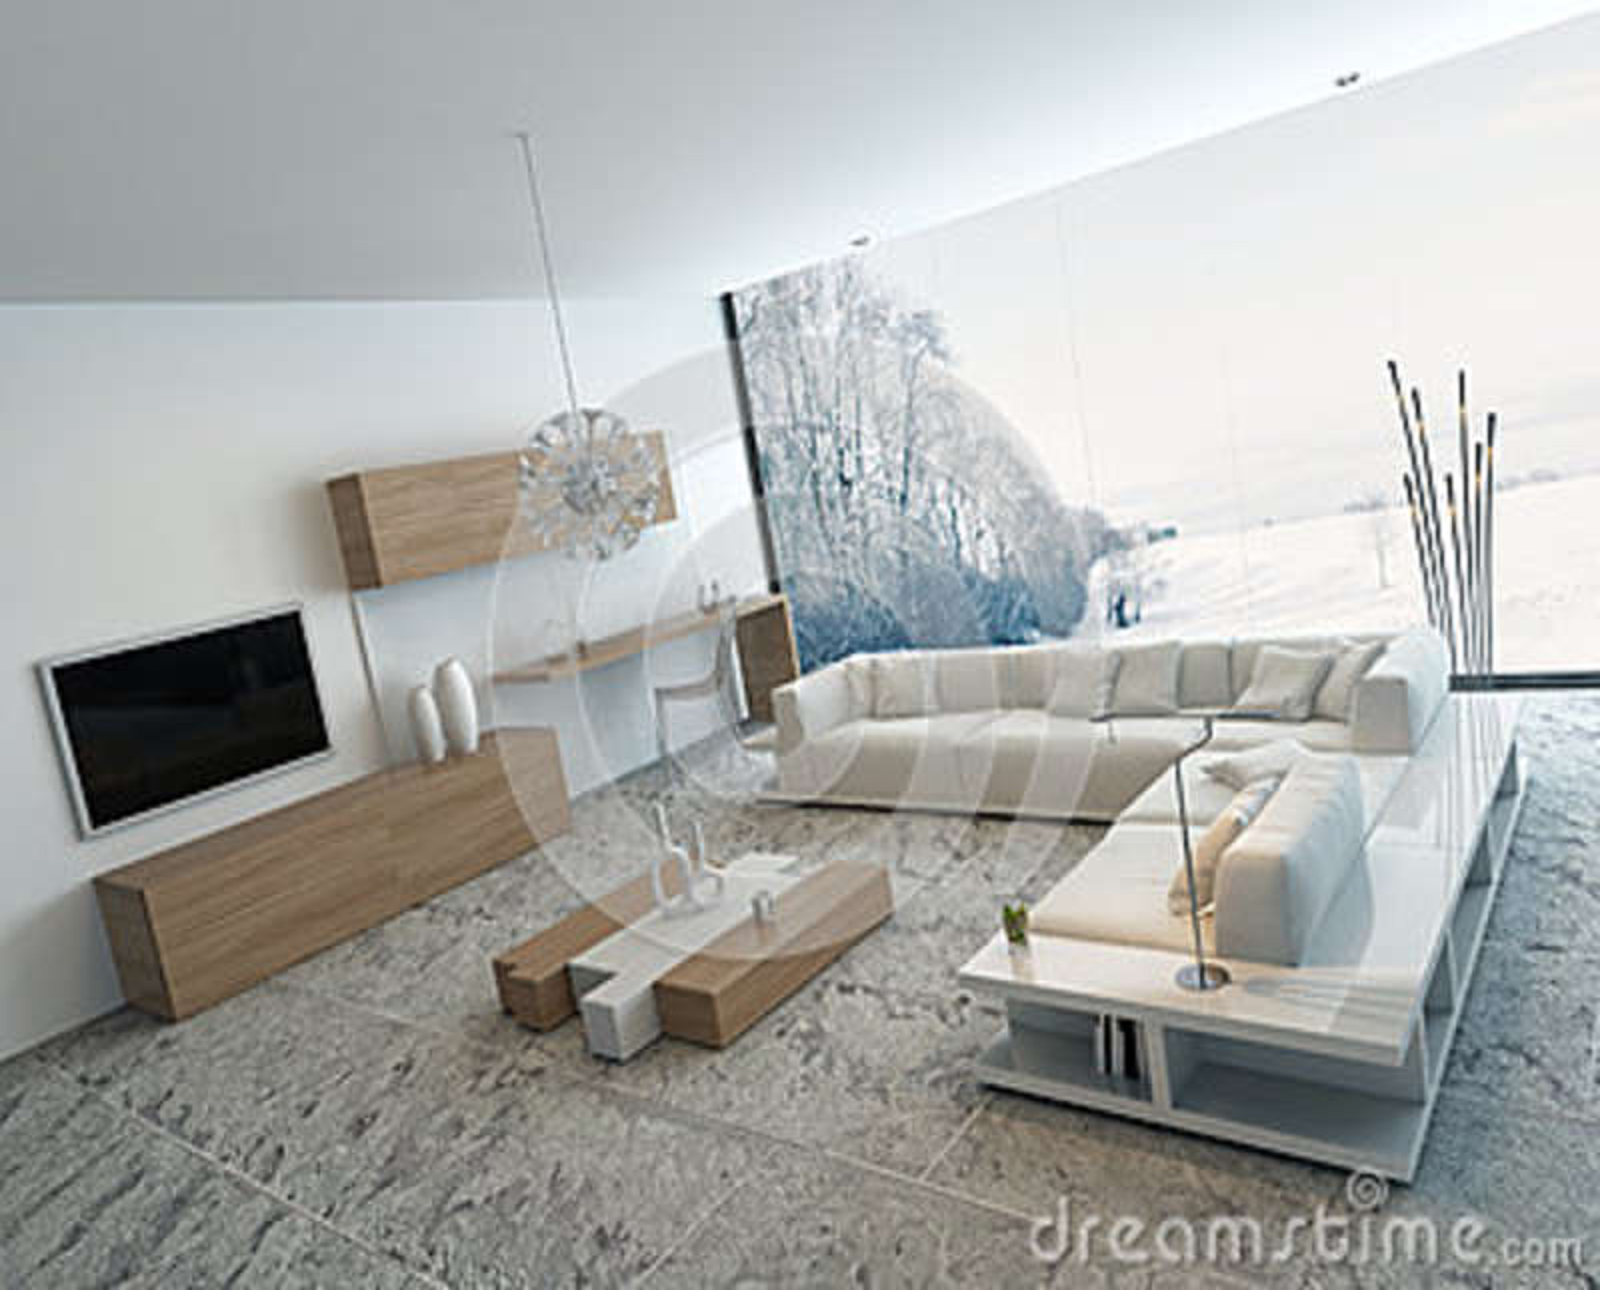 https fr dreamstime com illustration stock salon blanc moderne les meubles en bois image41133517